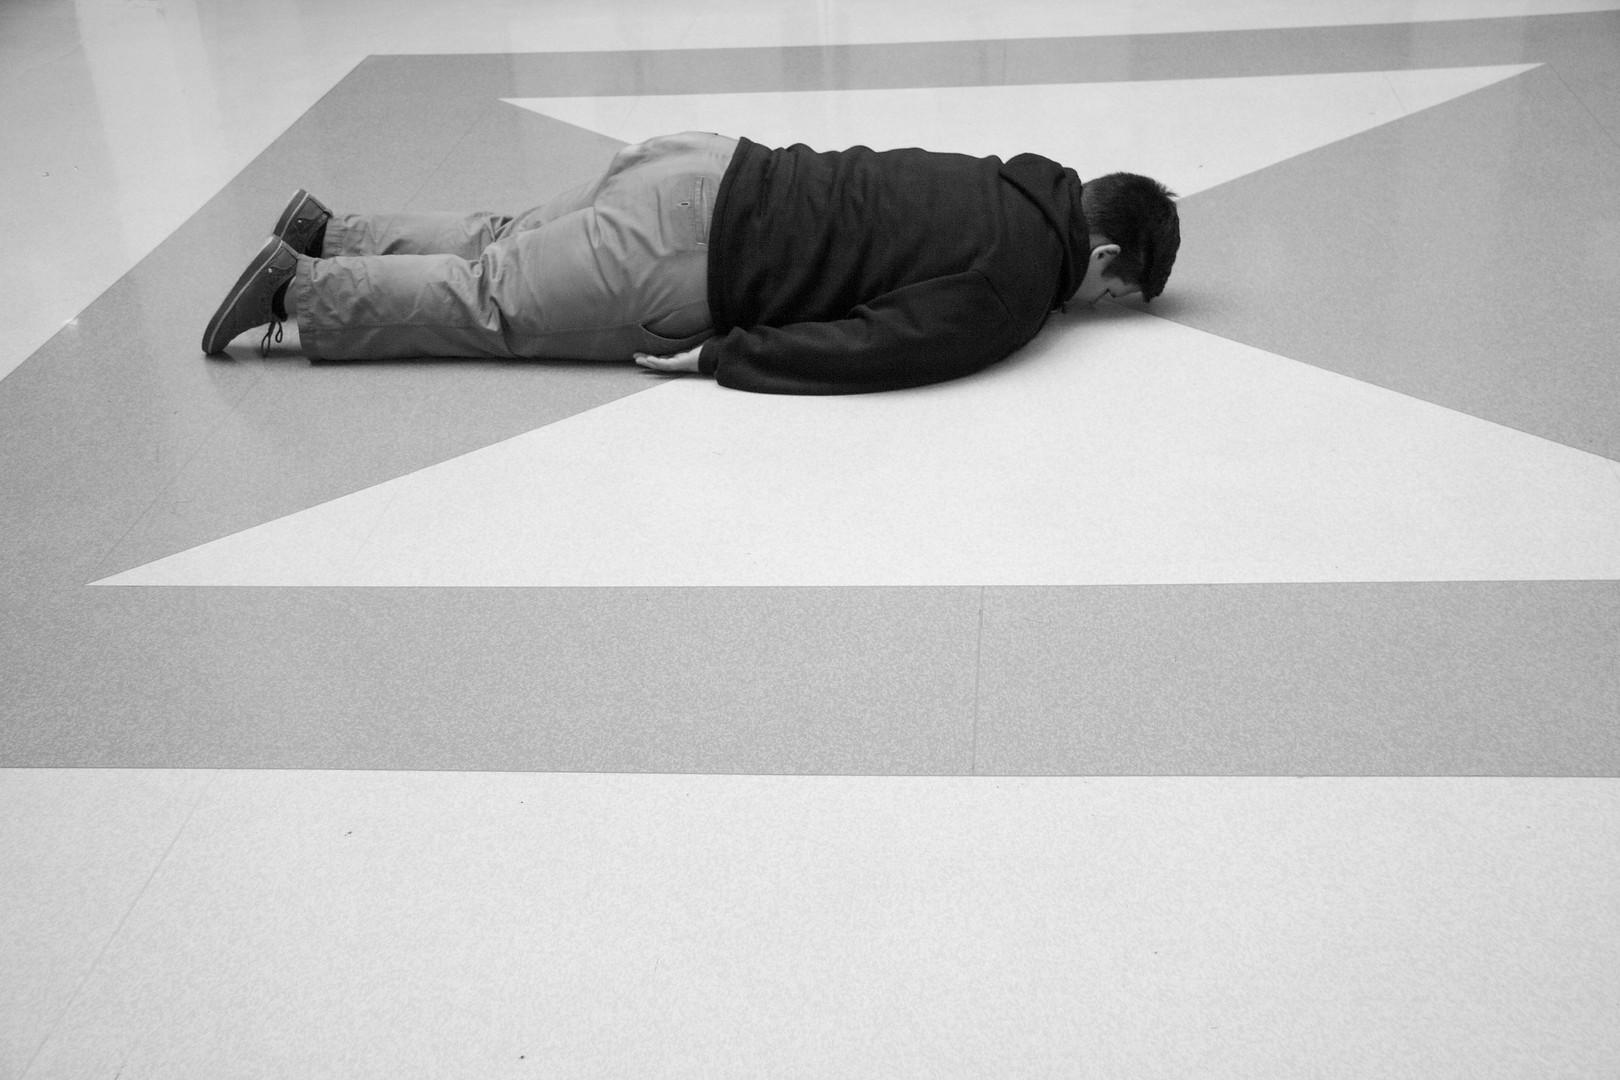 facing down on the floor in cross hair